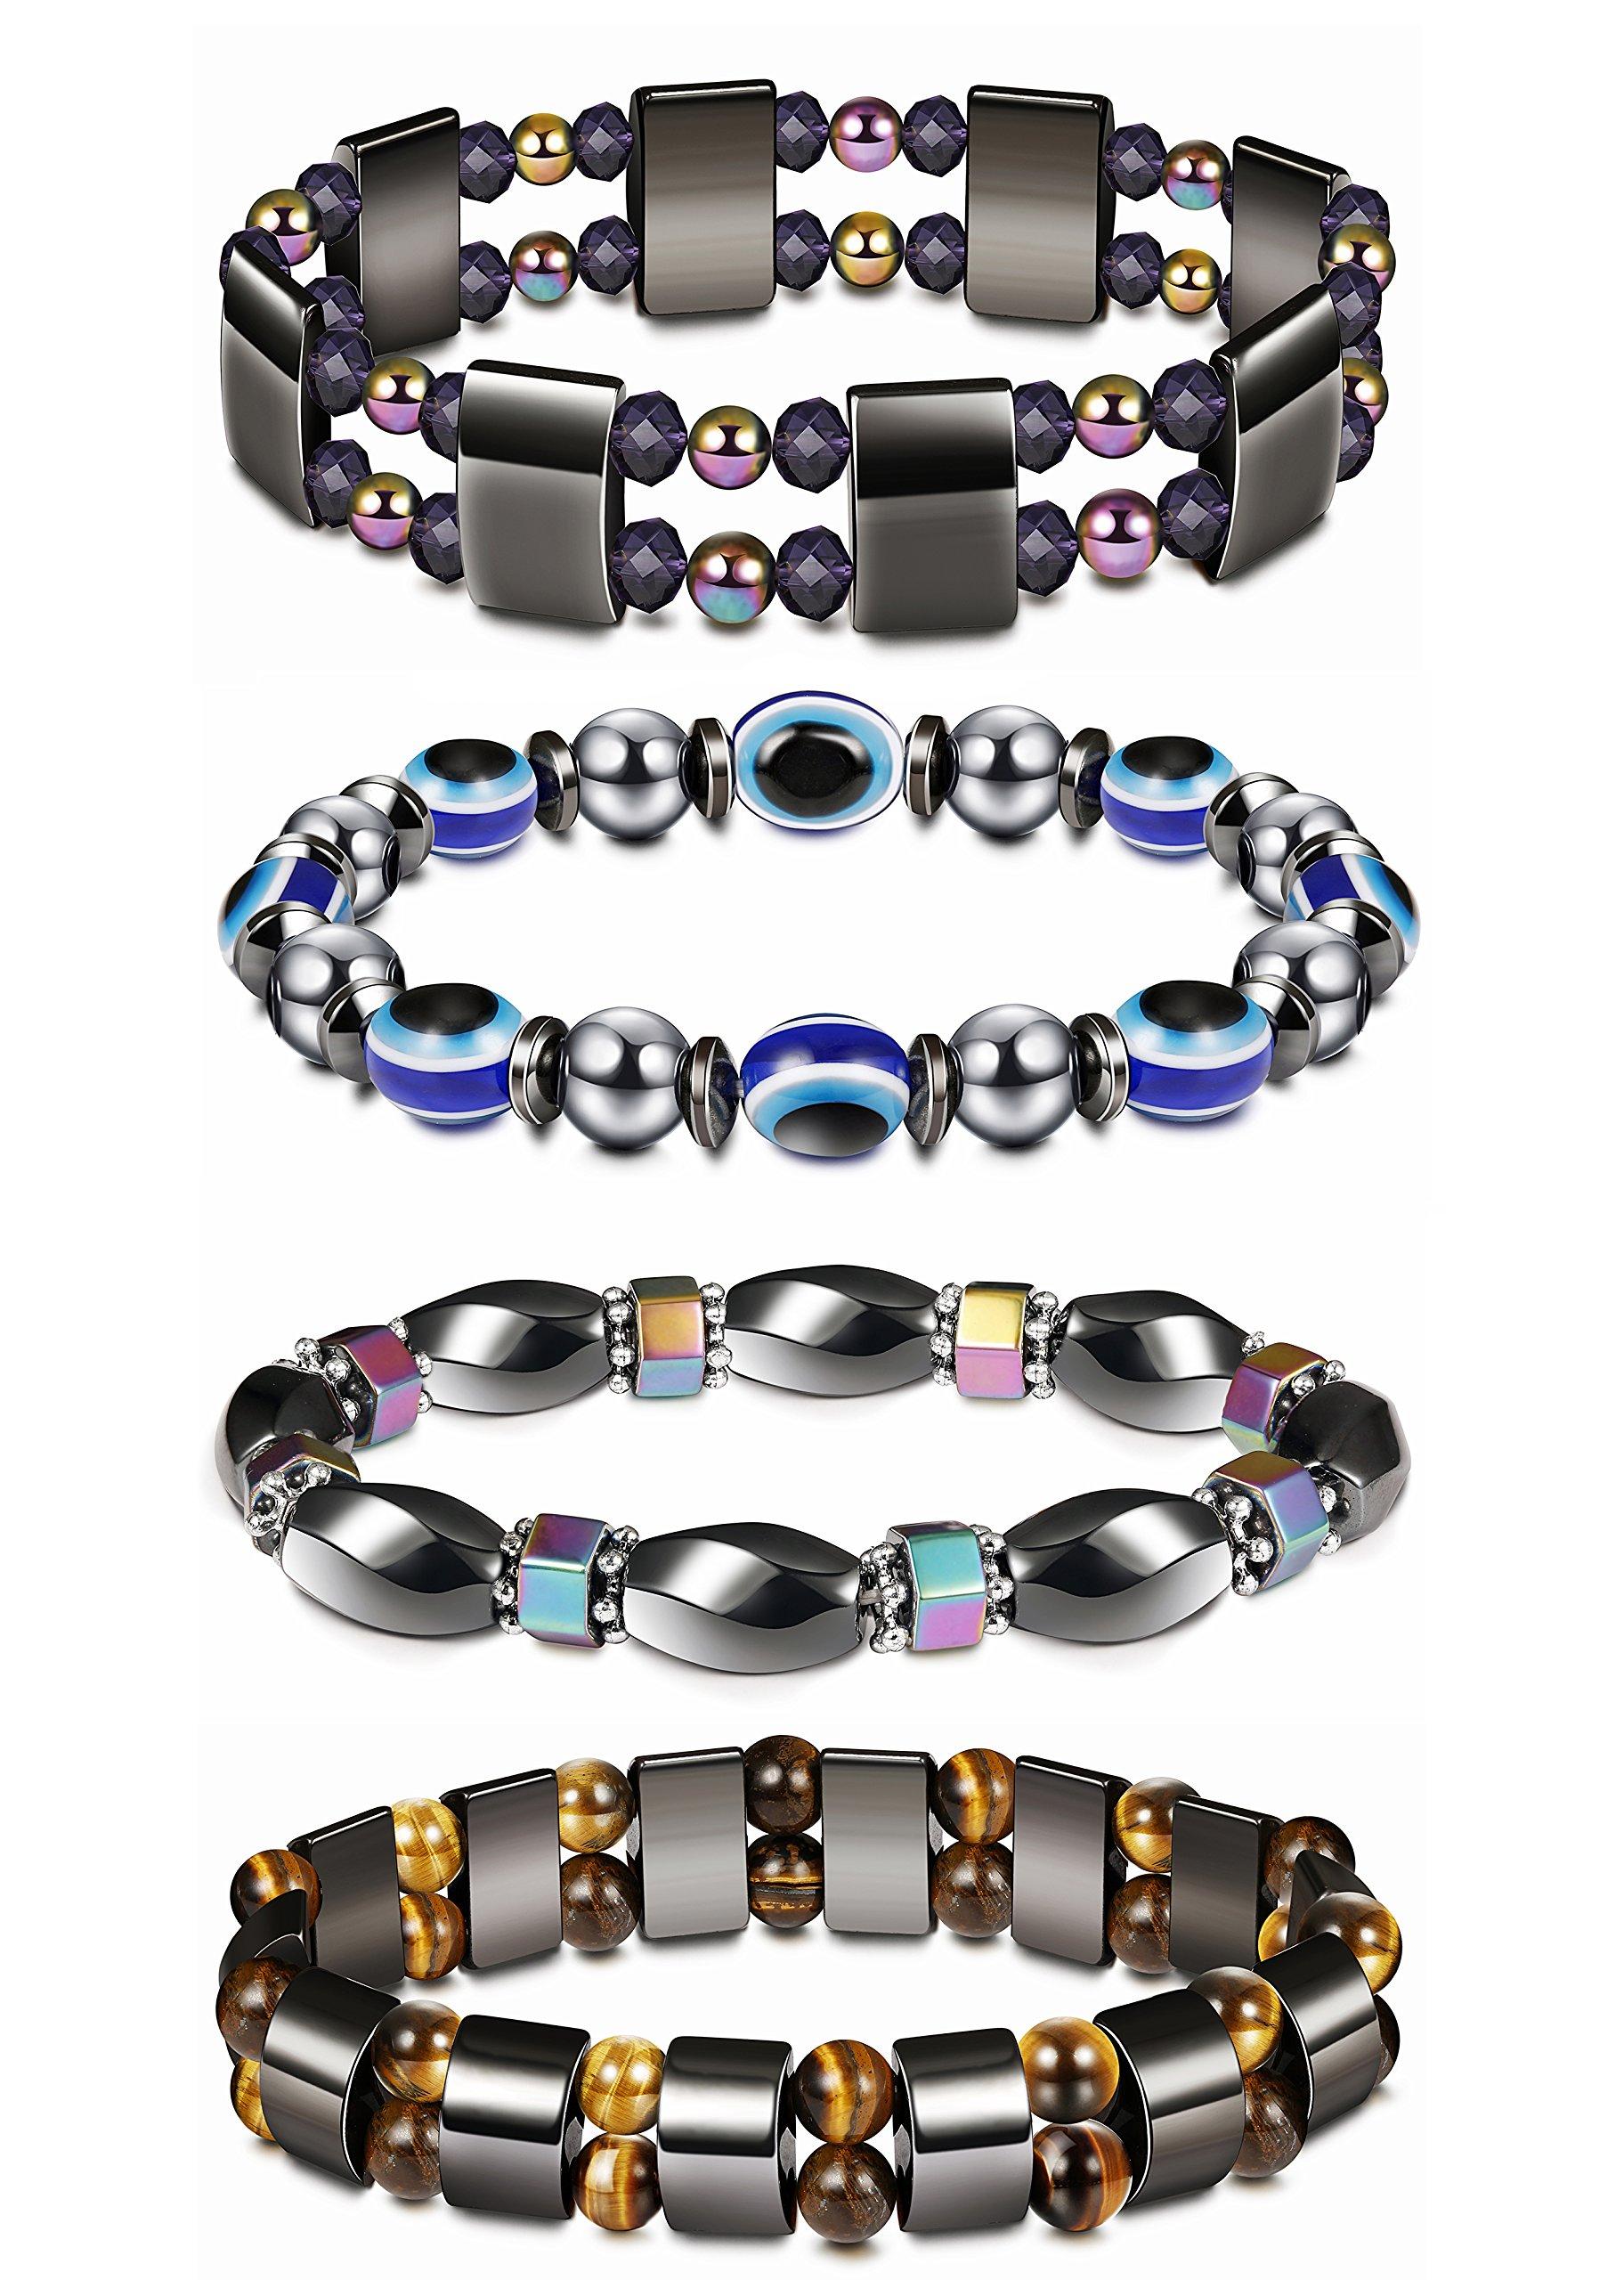 Thunaraz 4Pcs Hematite Bracelet for Men Women Reiki Healing Bangle Bracelet Energy Magnetic Tiger Eye Therapy Bracelets